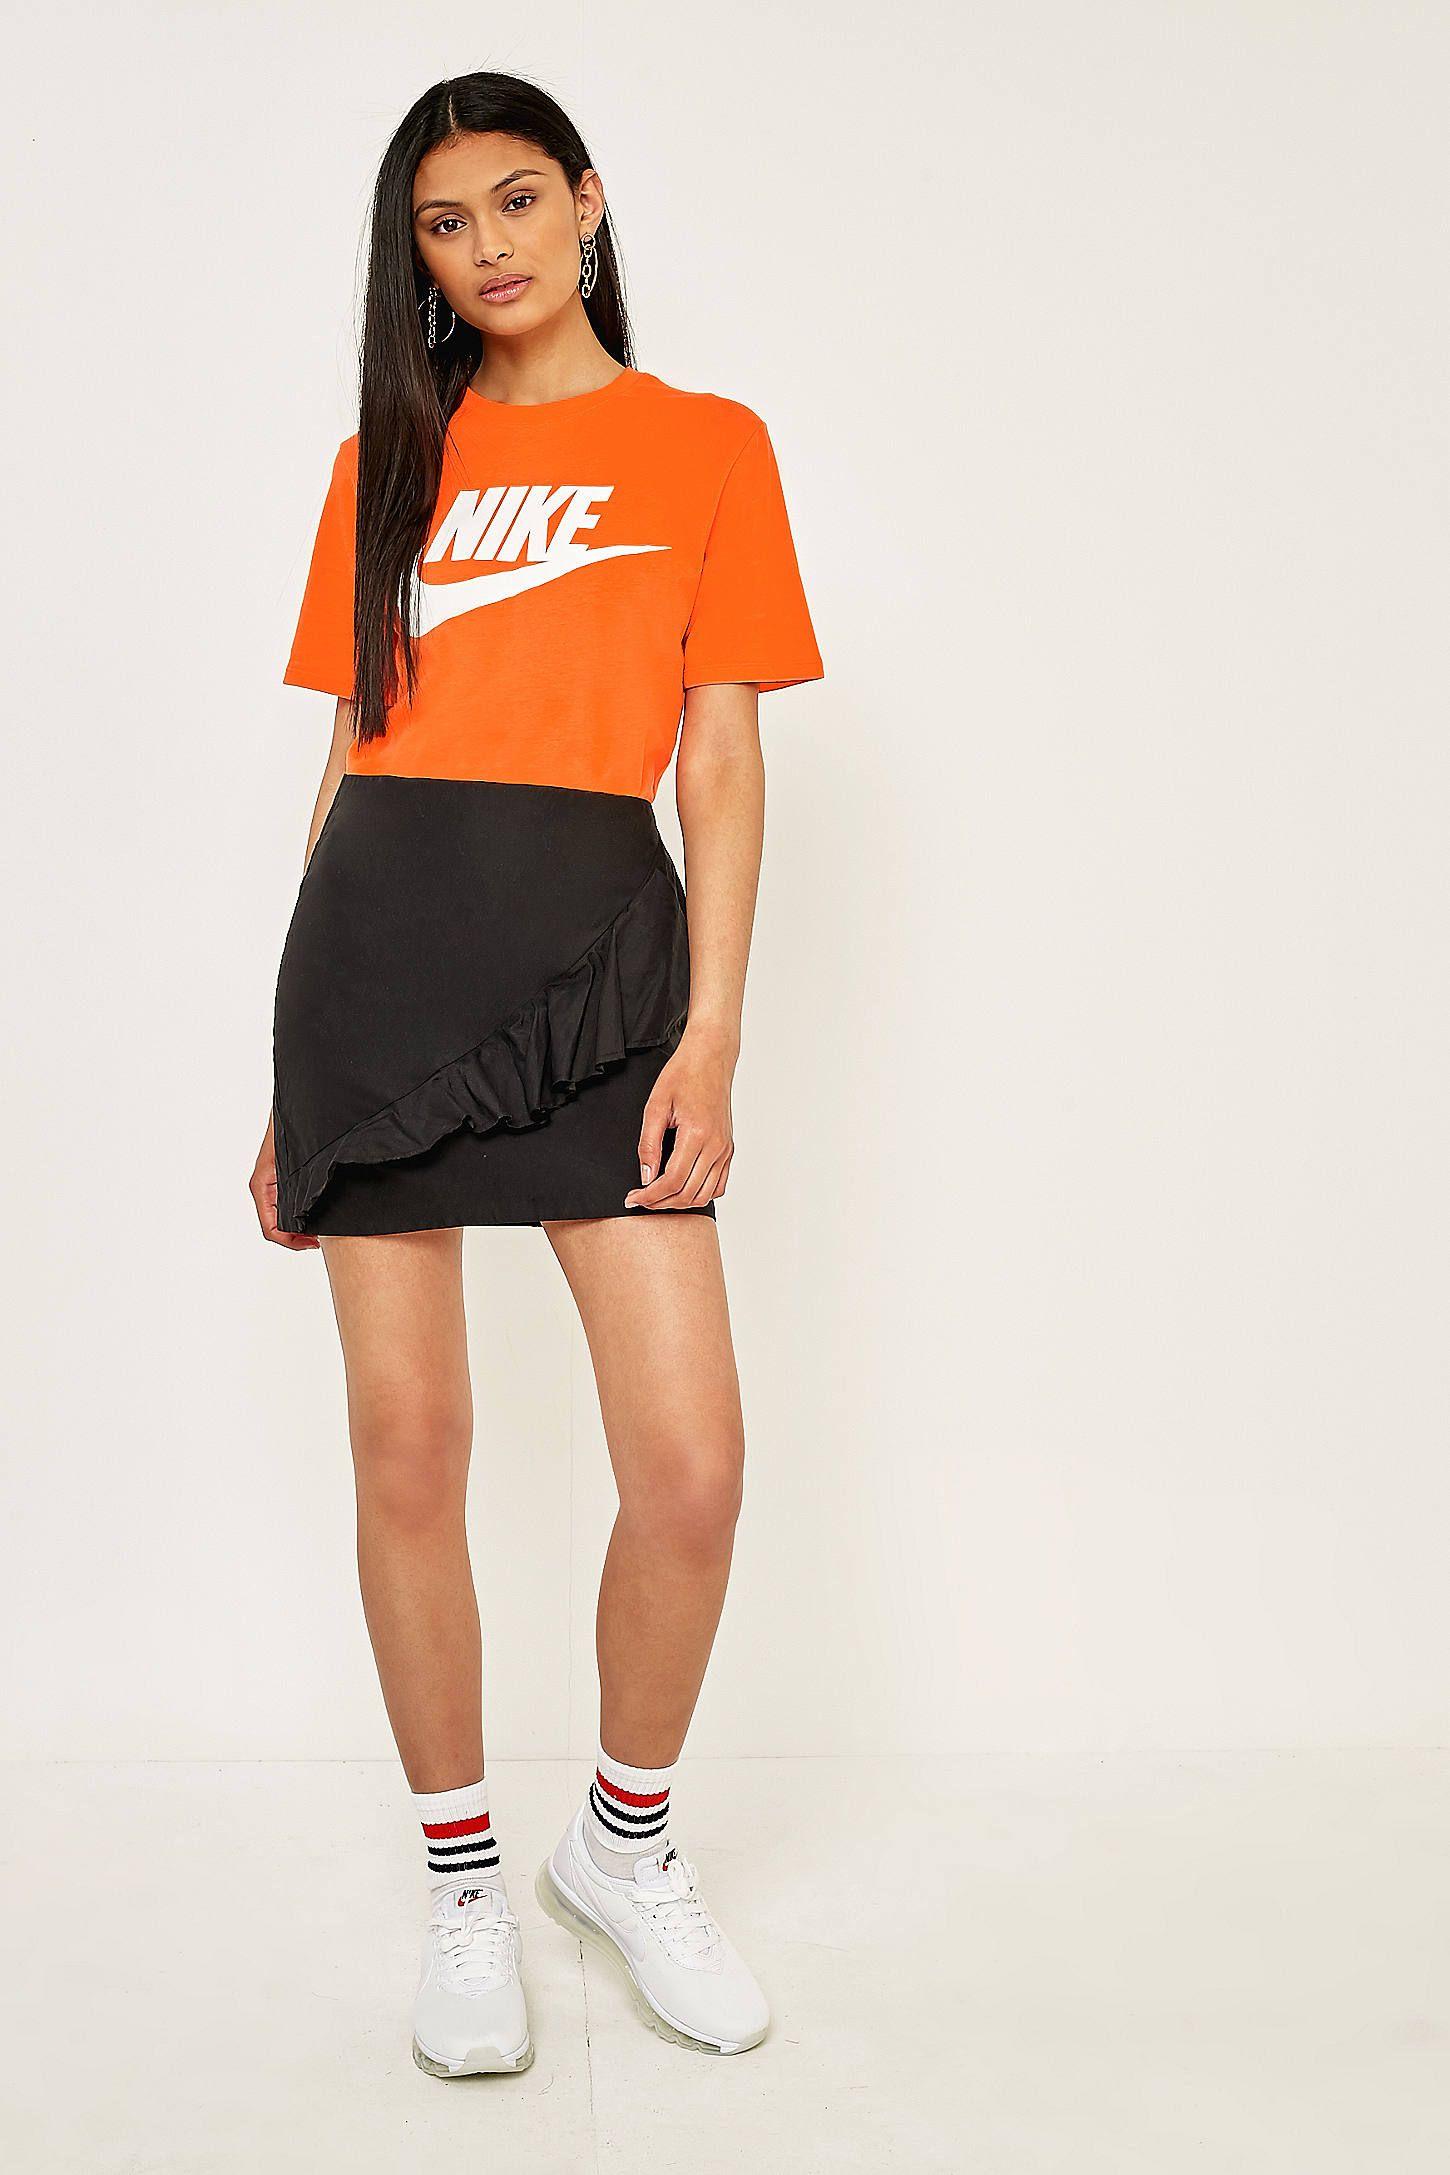 Nike essential swoosh orange tshirt orange t shirts